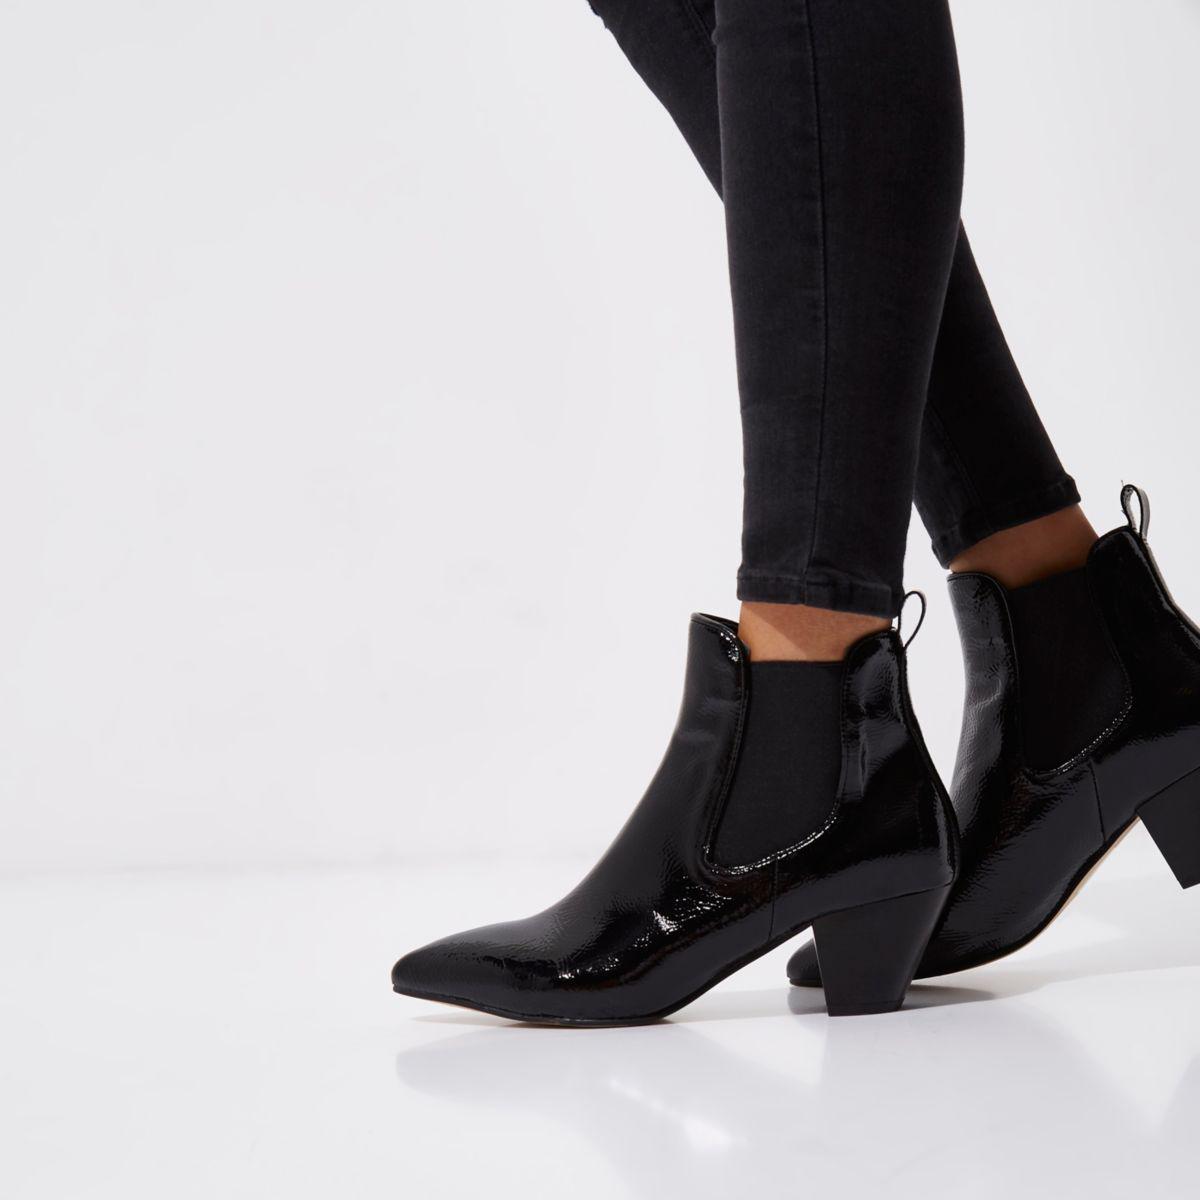 Black Patent Rip Shoes